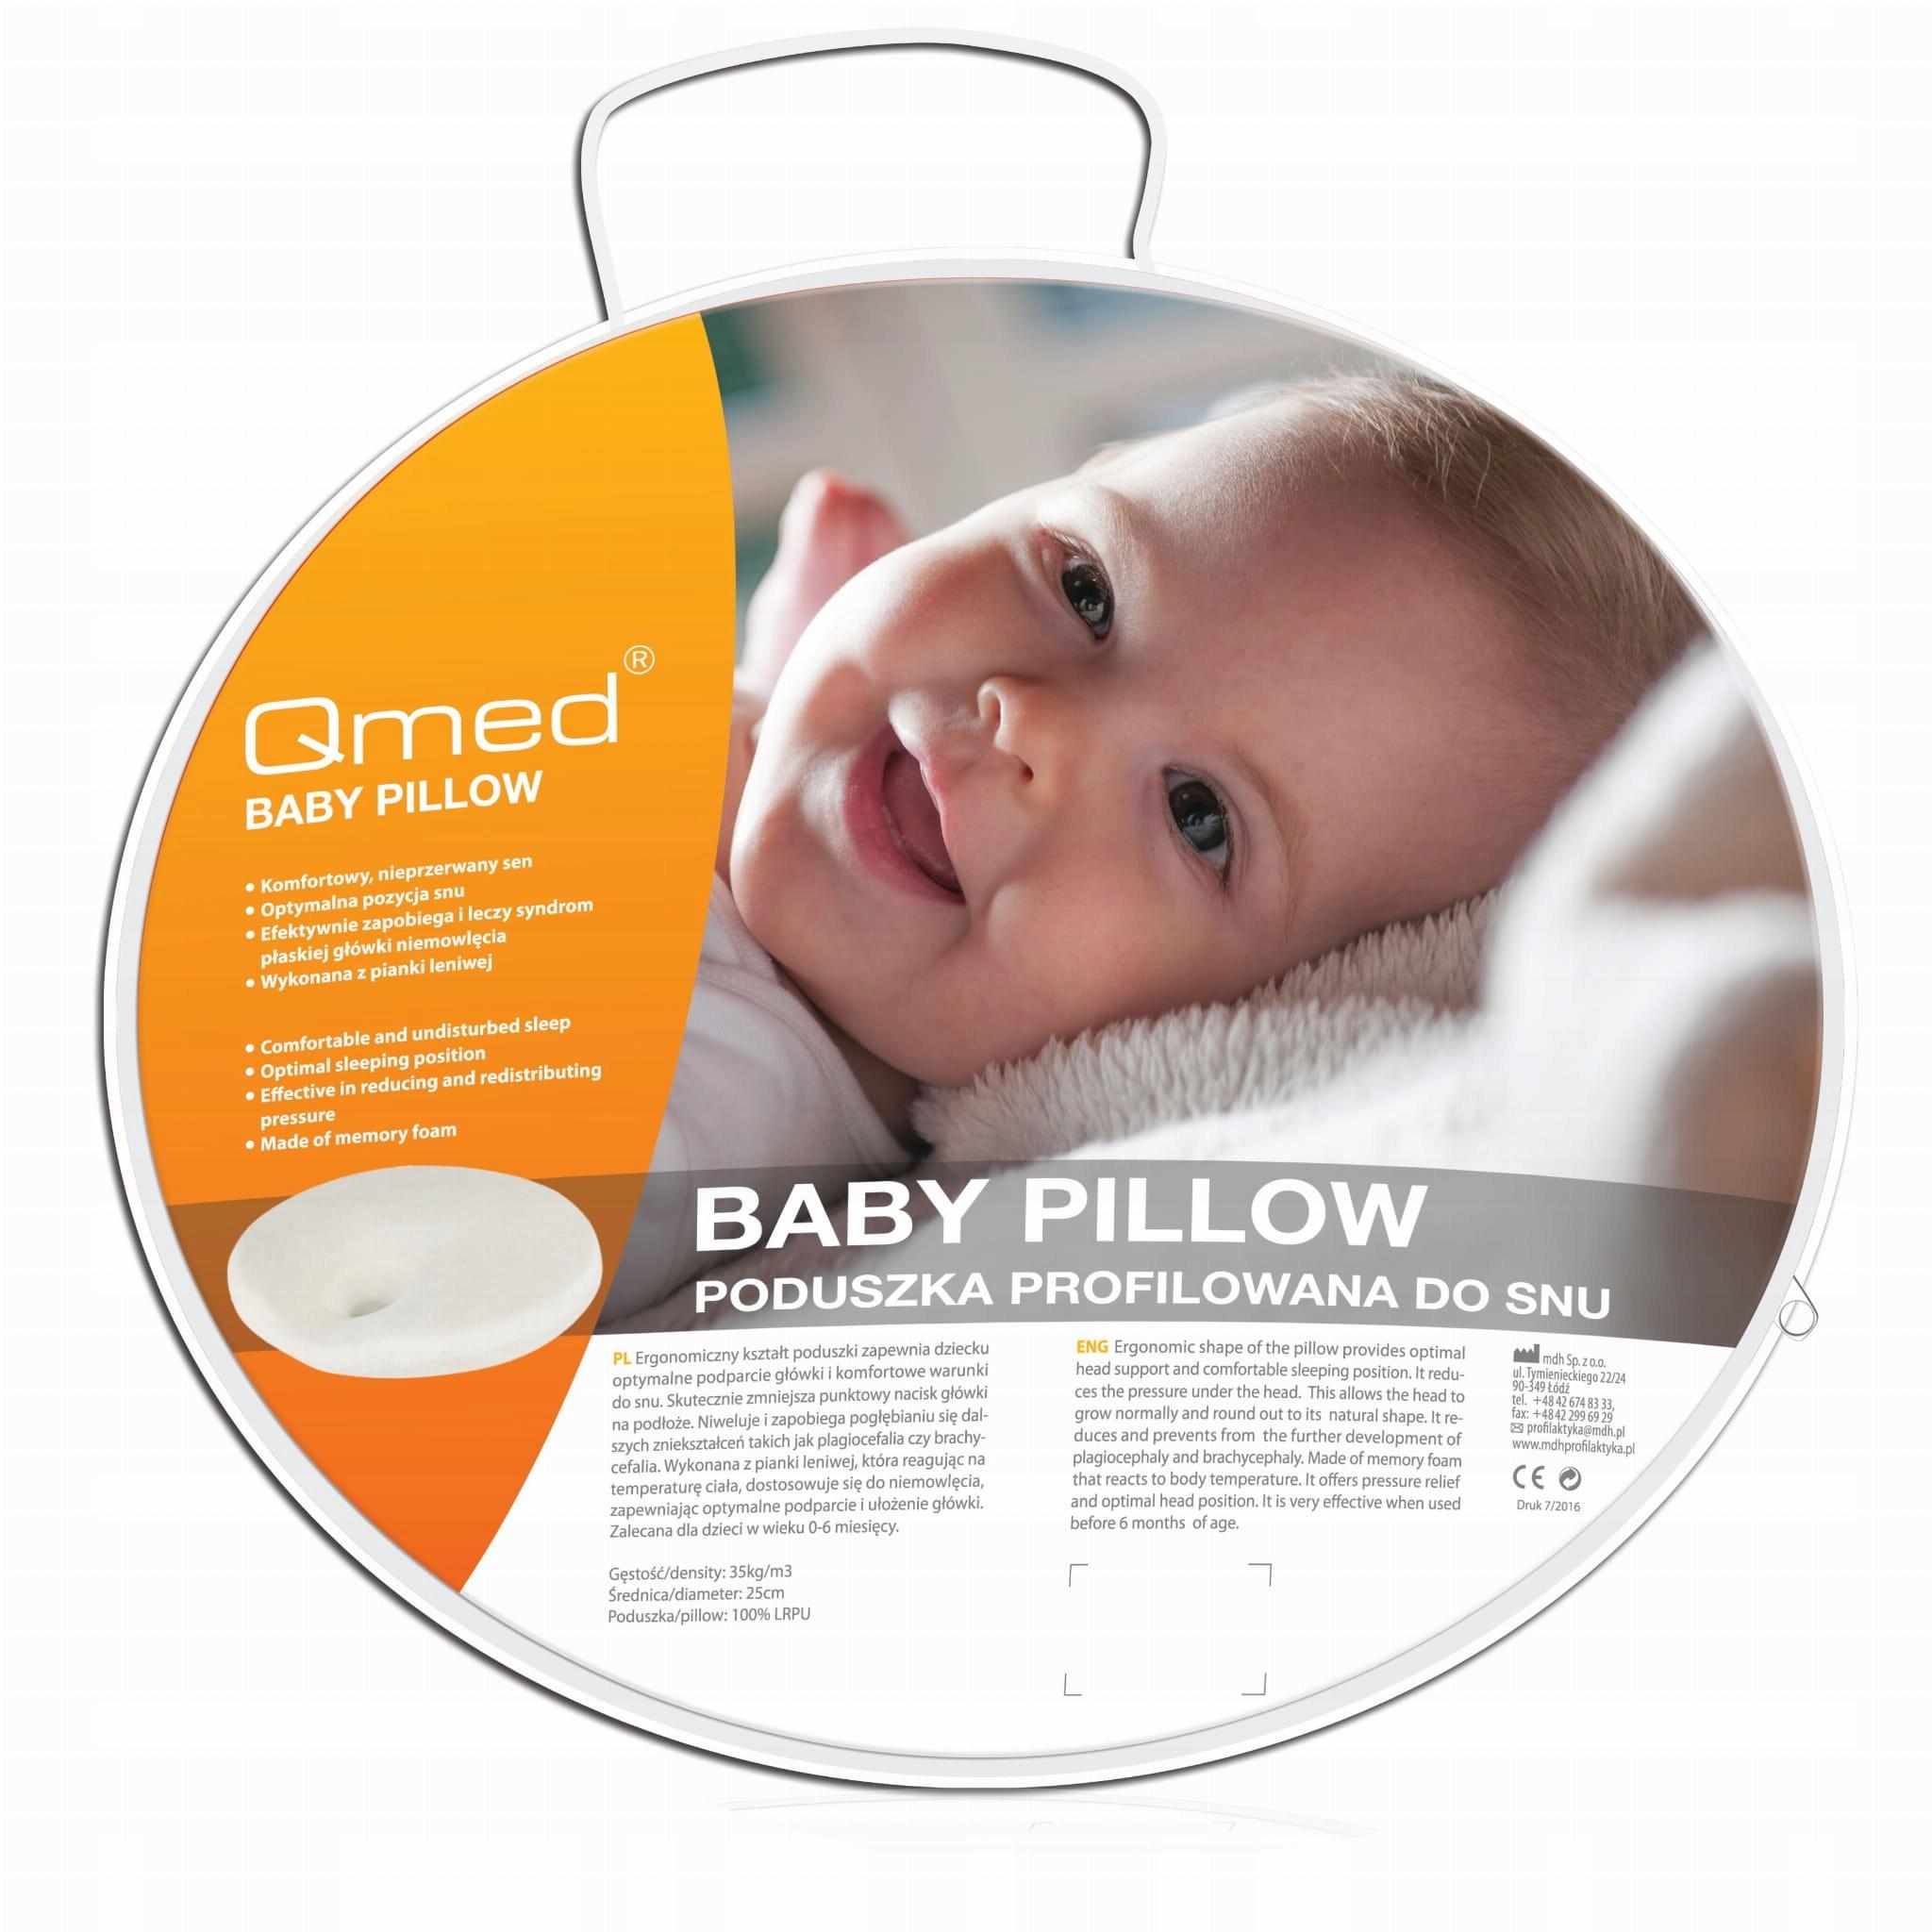 Poduszka dla noworodka Qmed Baby Pillow 9145276914 - Allegro.pl